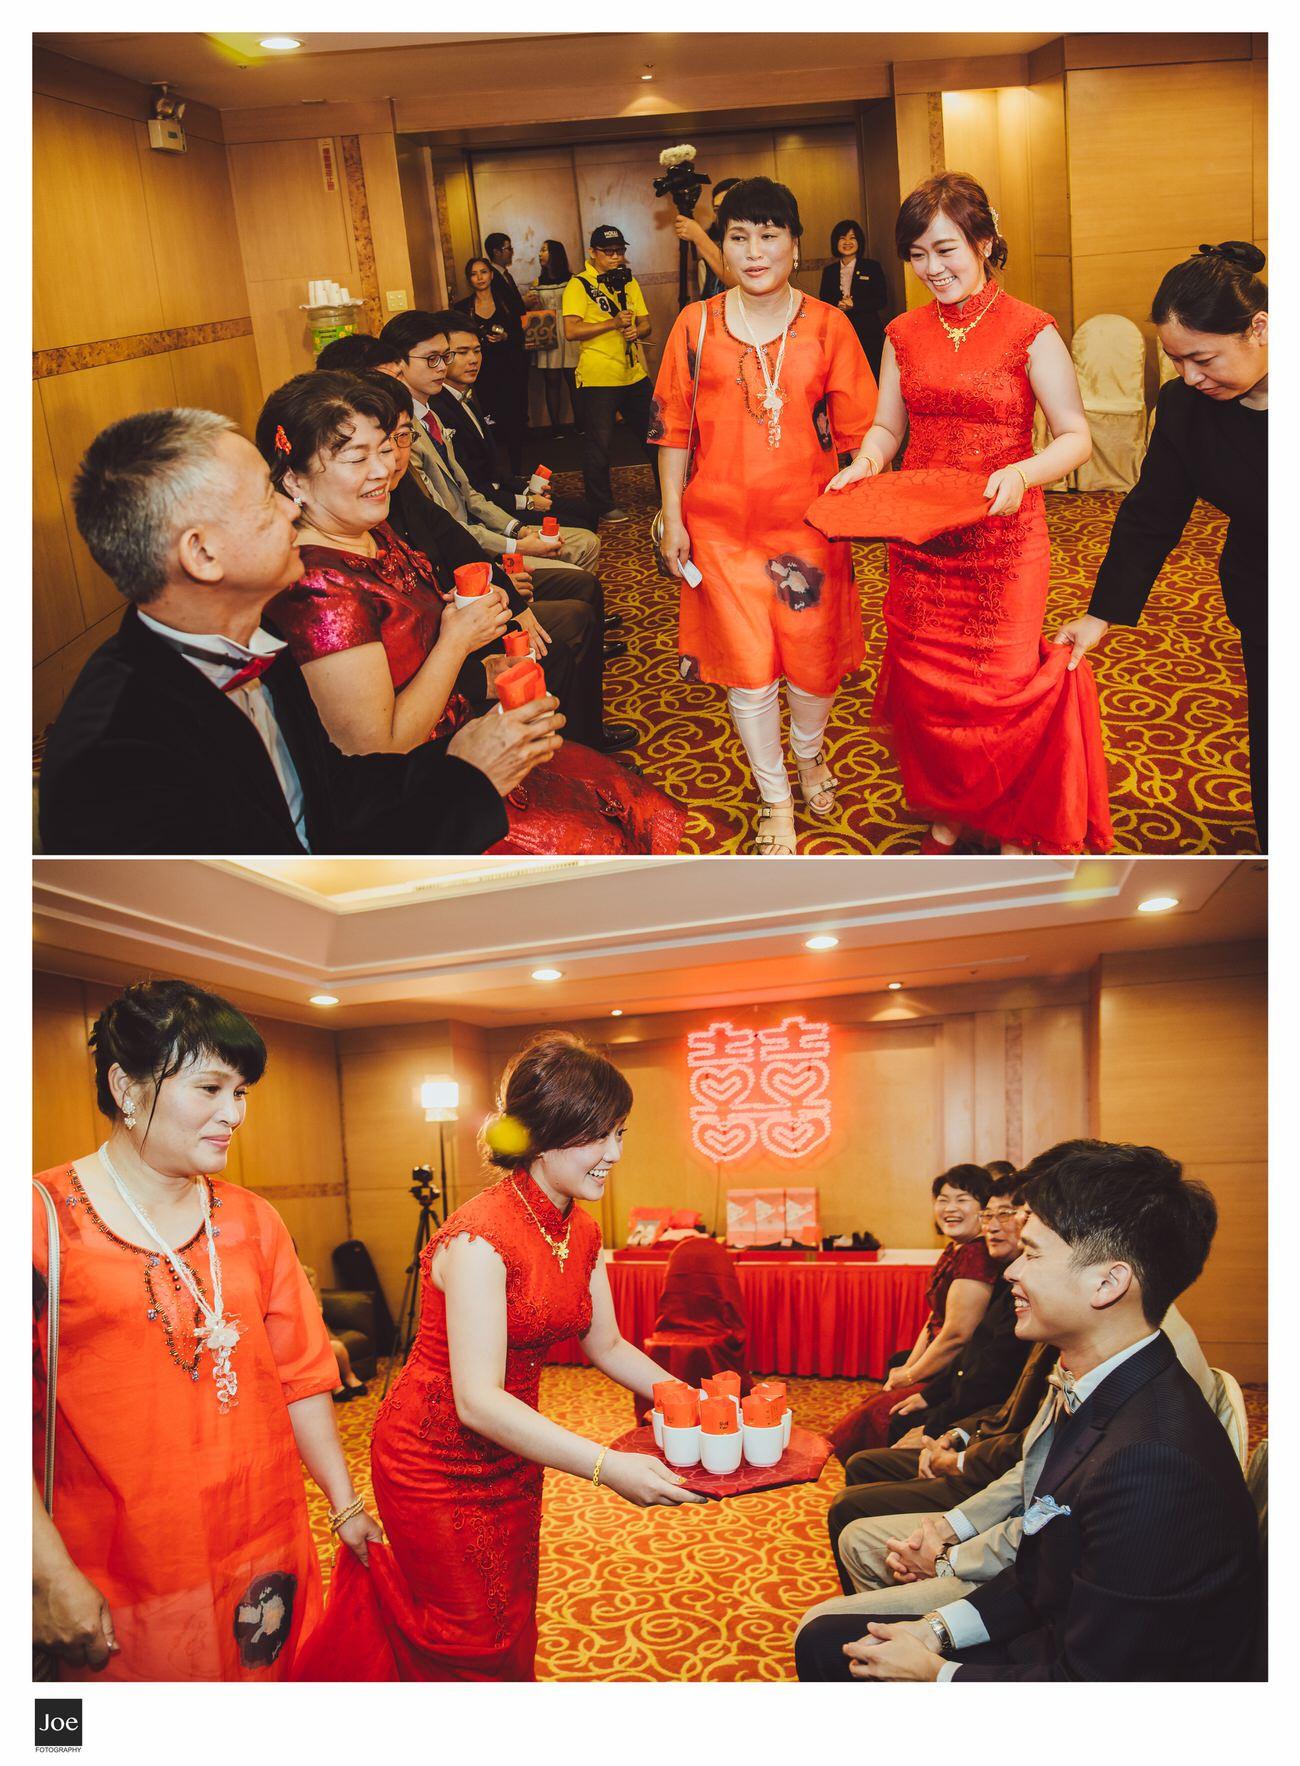 sunworld-dynasty-hotel-taipei-wedding-photo-joe-fotography-angel-jay-015.jpg